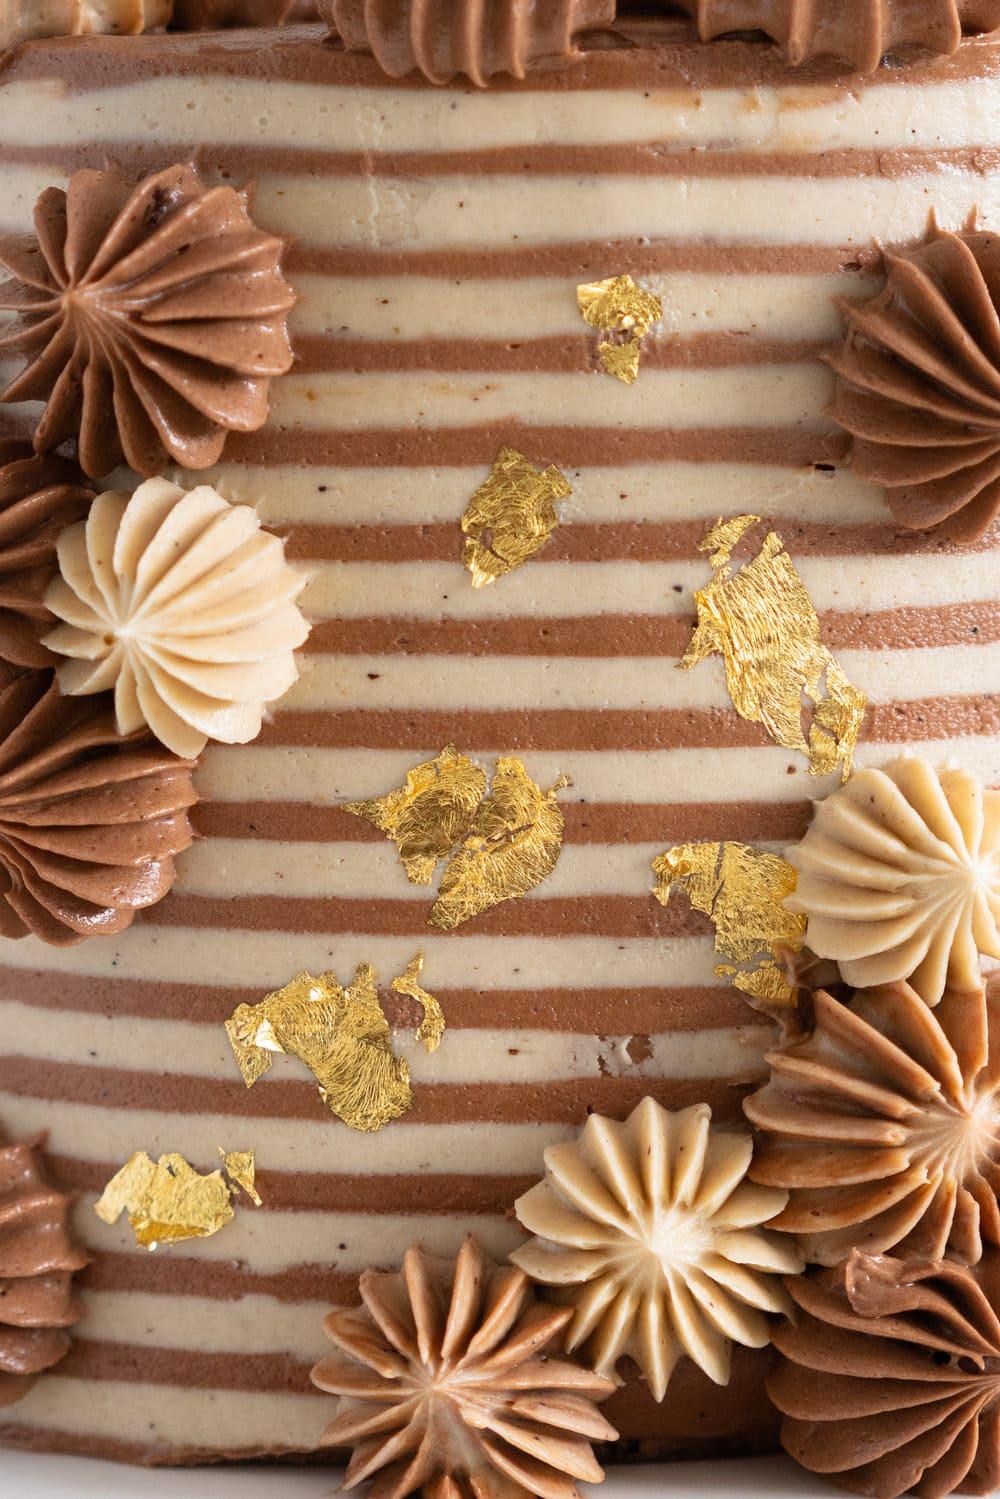 Chocolate Brownie Cake with Chocolate Hazelnut filling and Mocha German Buttercream - perfectly indulgent.